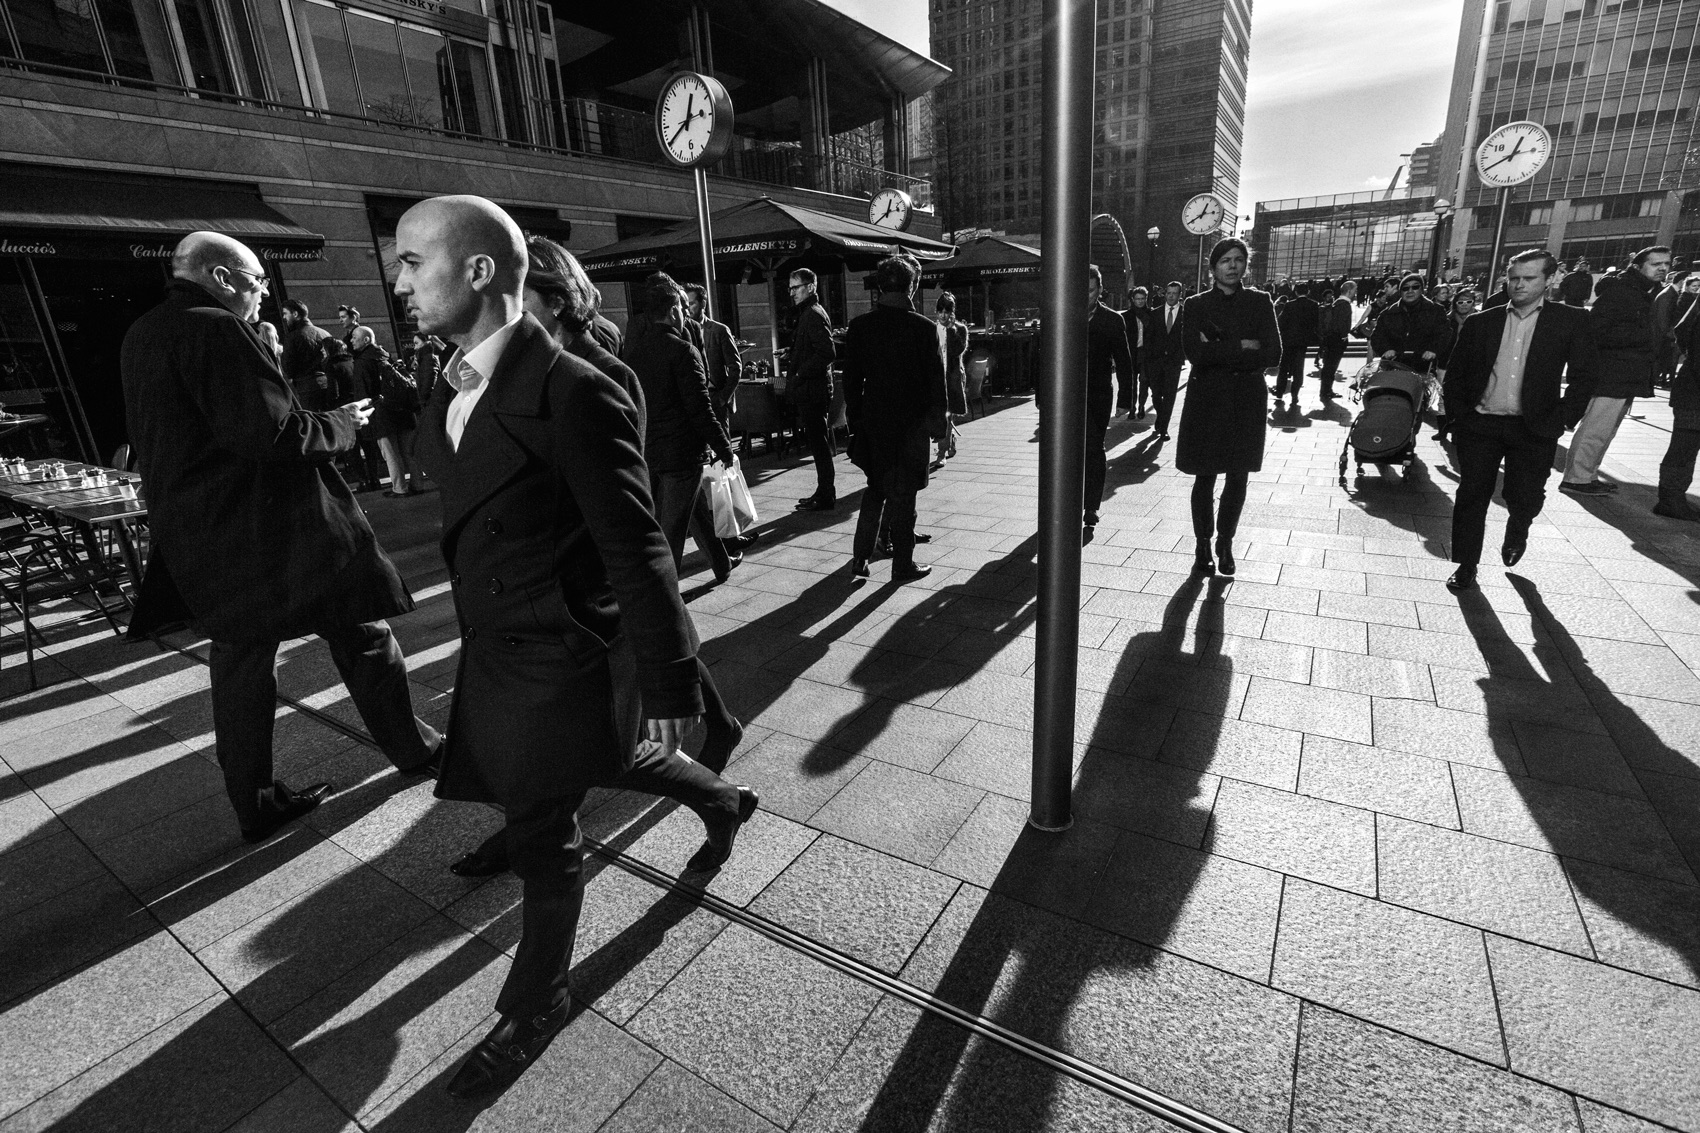 street-documentary-photography-fabio-burrelli-18.jpg